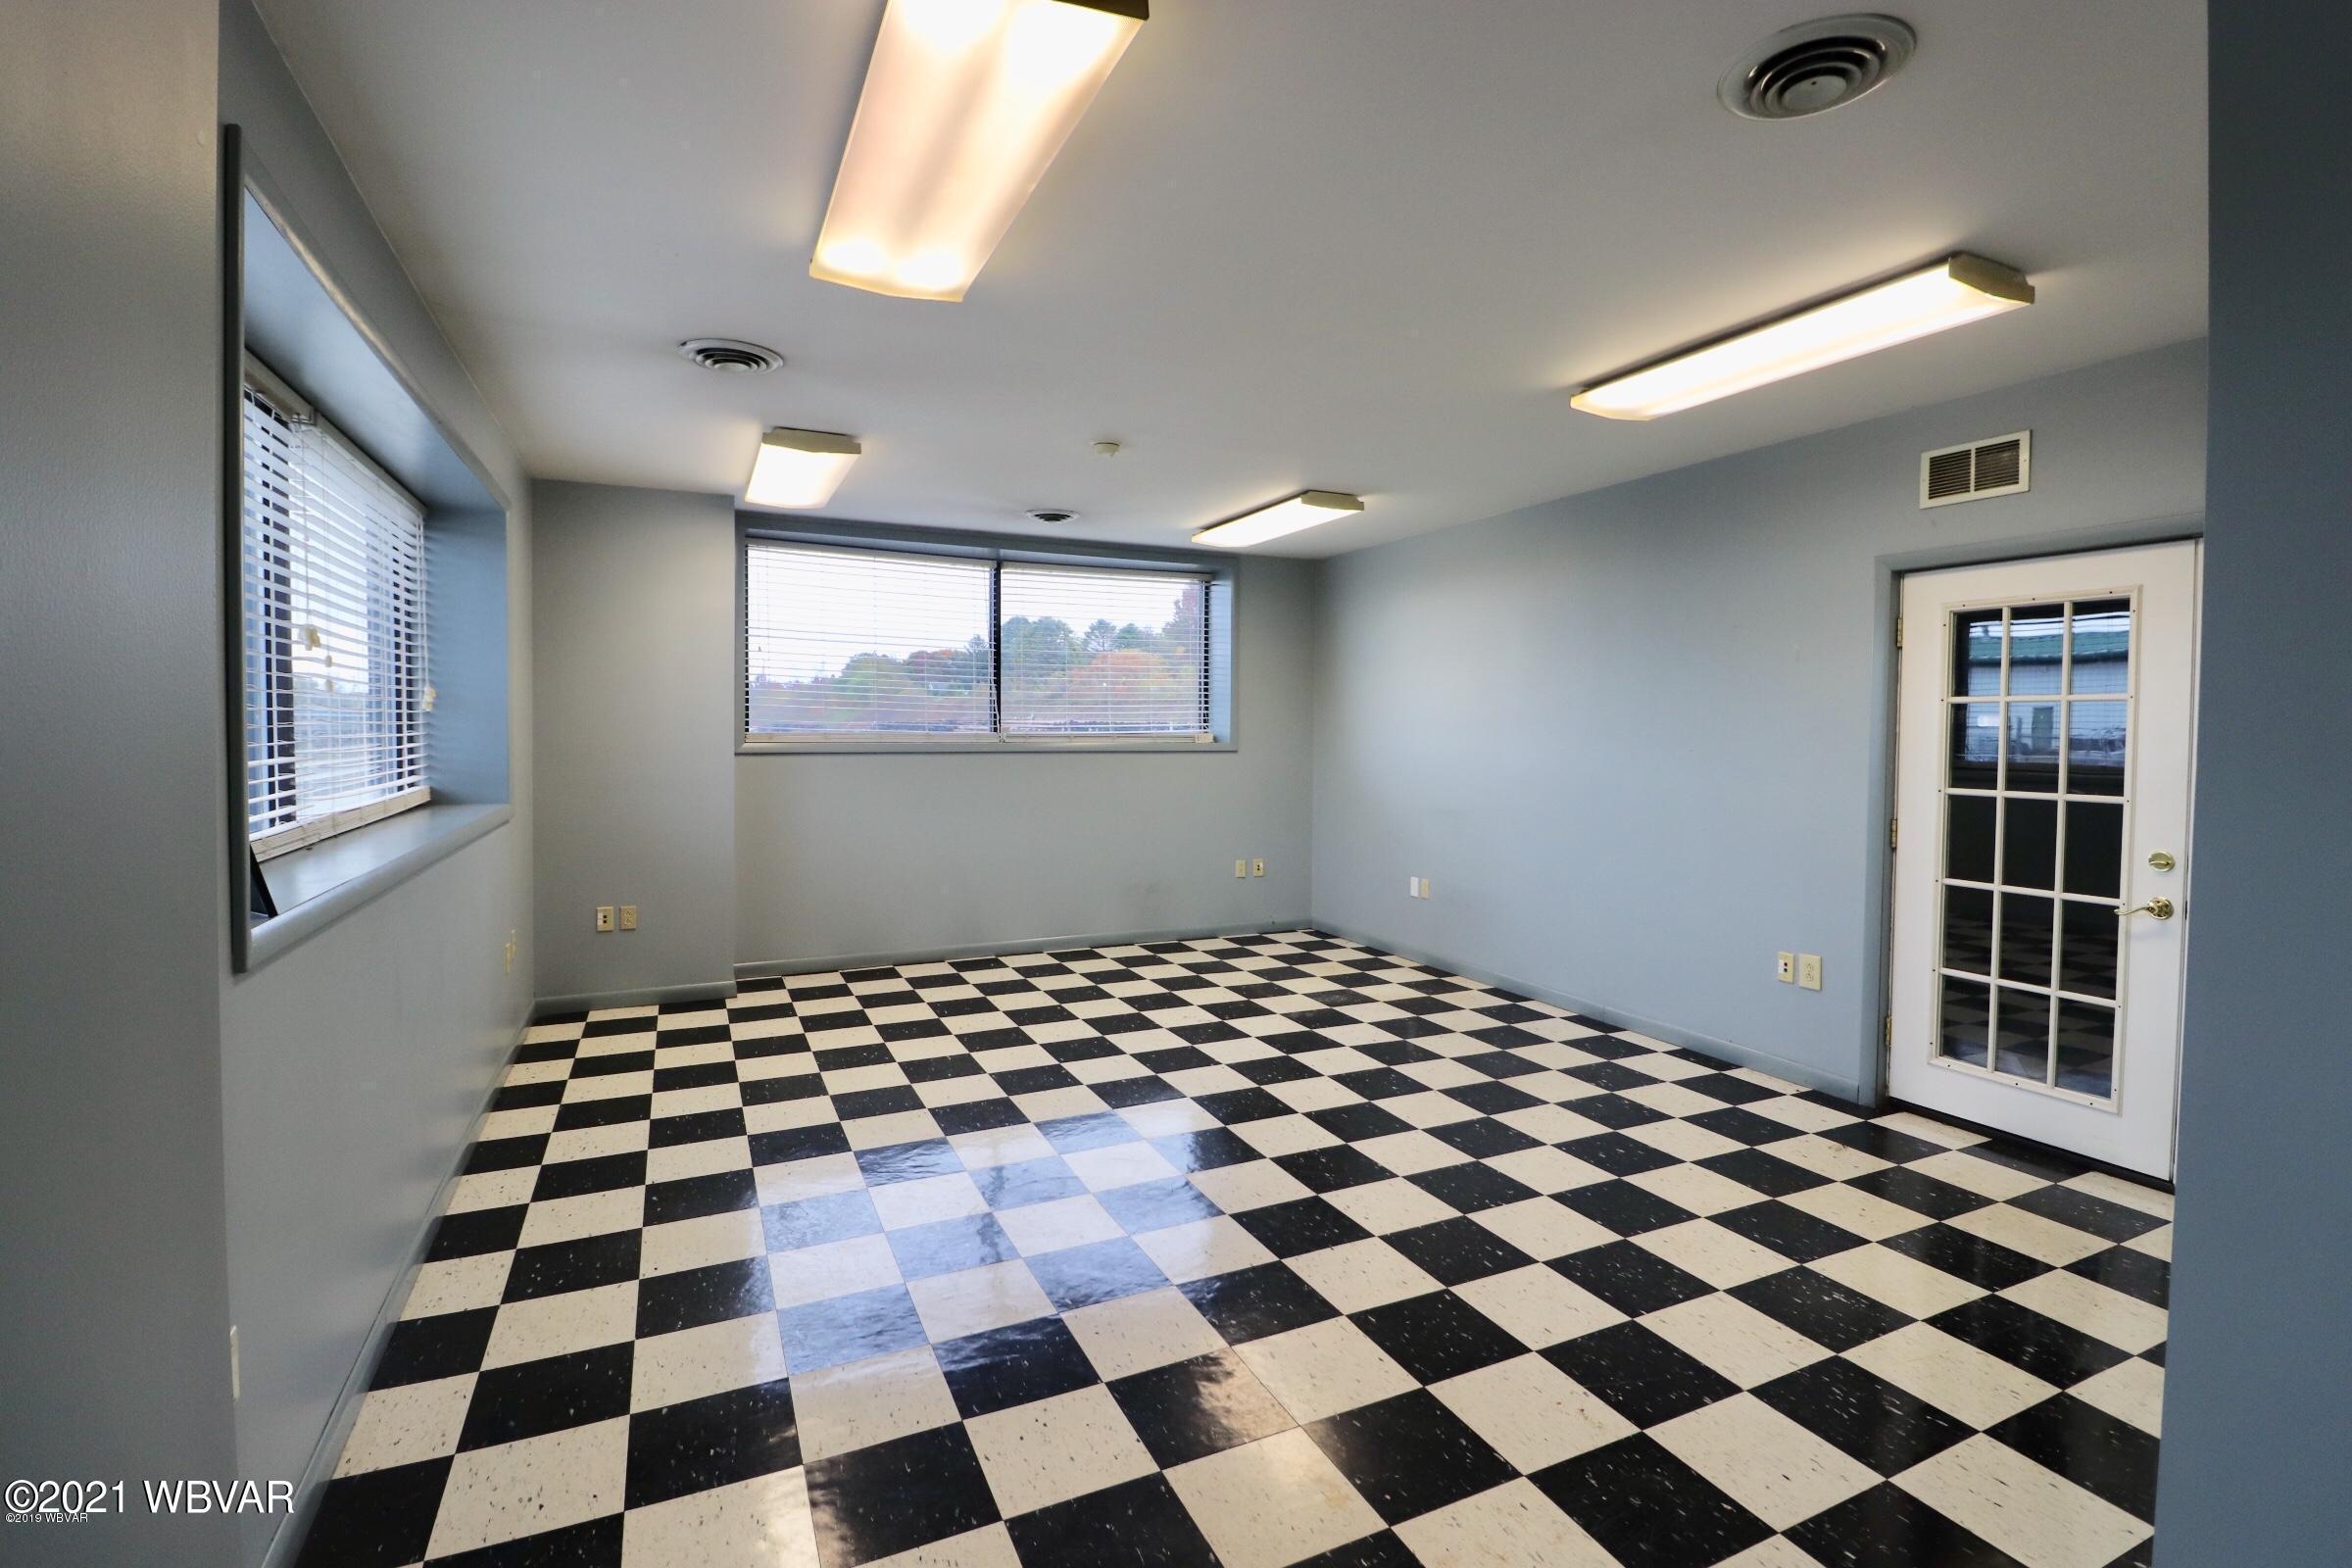 2 Tyler interior 1